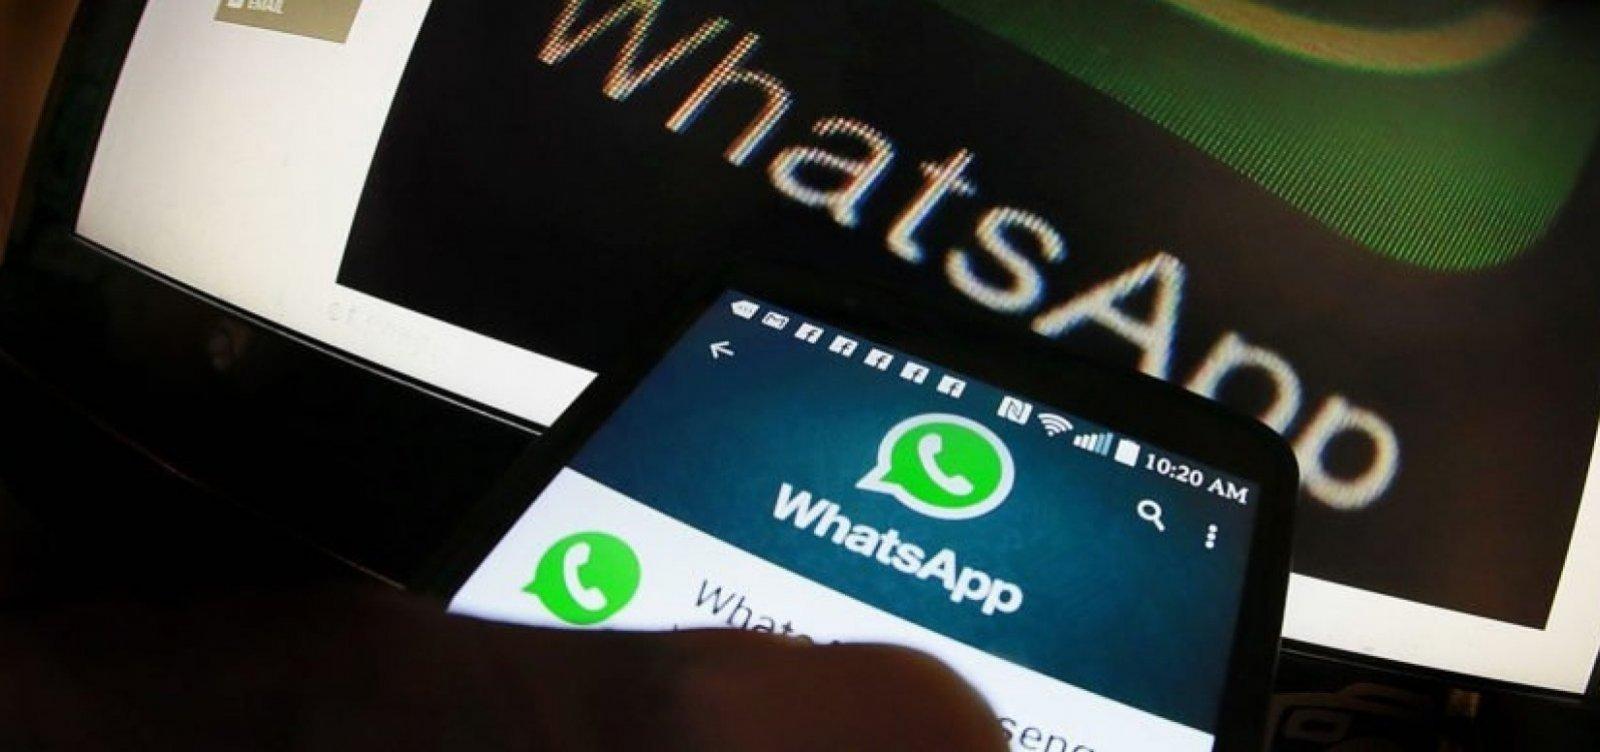 Ibope: WhatsApp teve impacto limitado no 1º turno